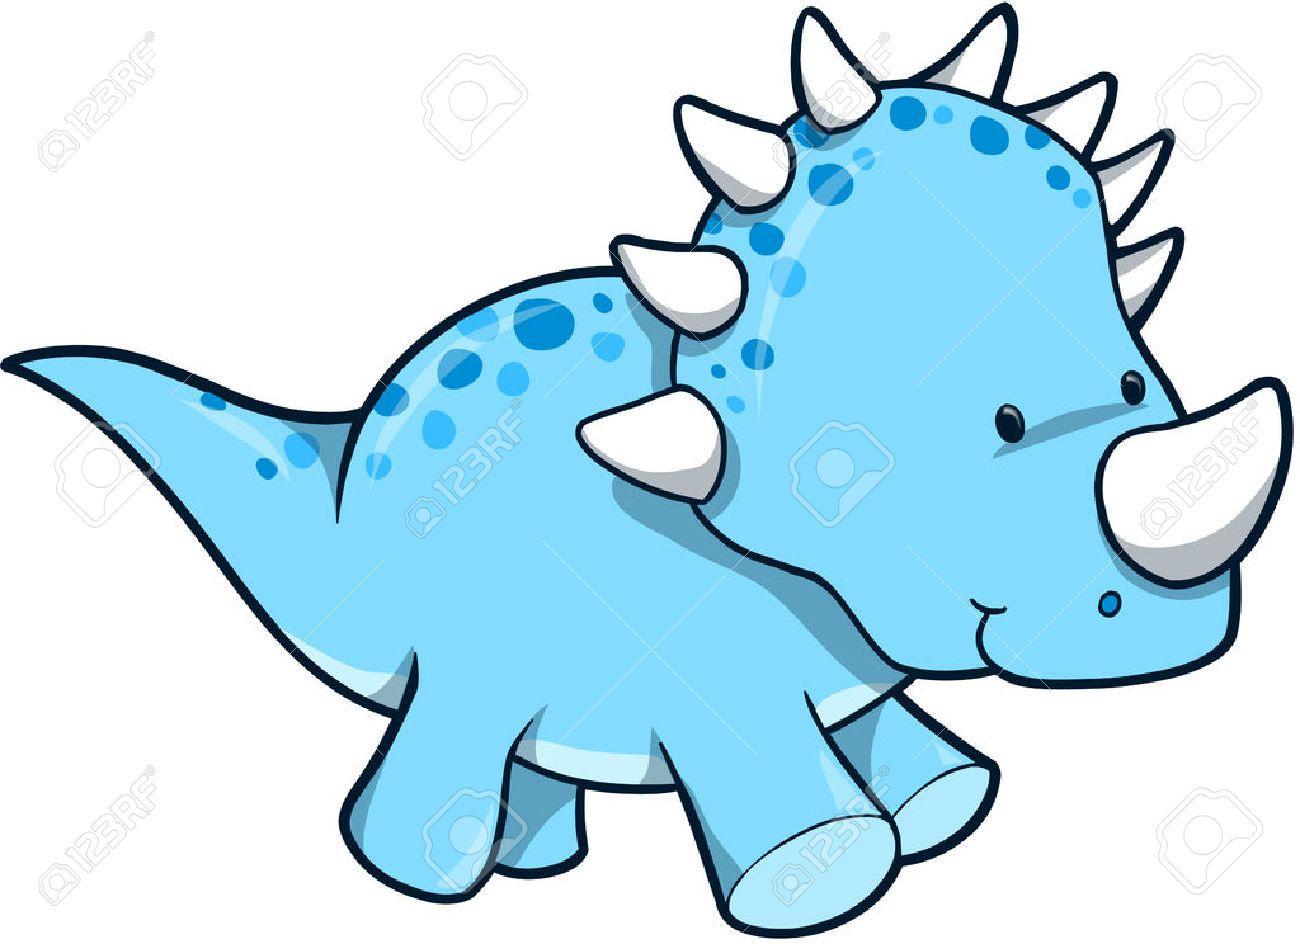 Stock dinosaurs in space. Clipart dinosaur vector